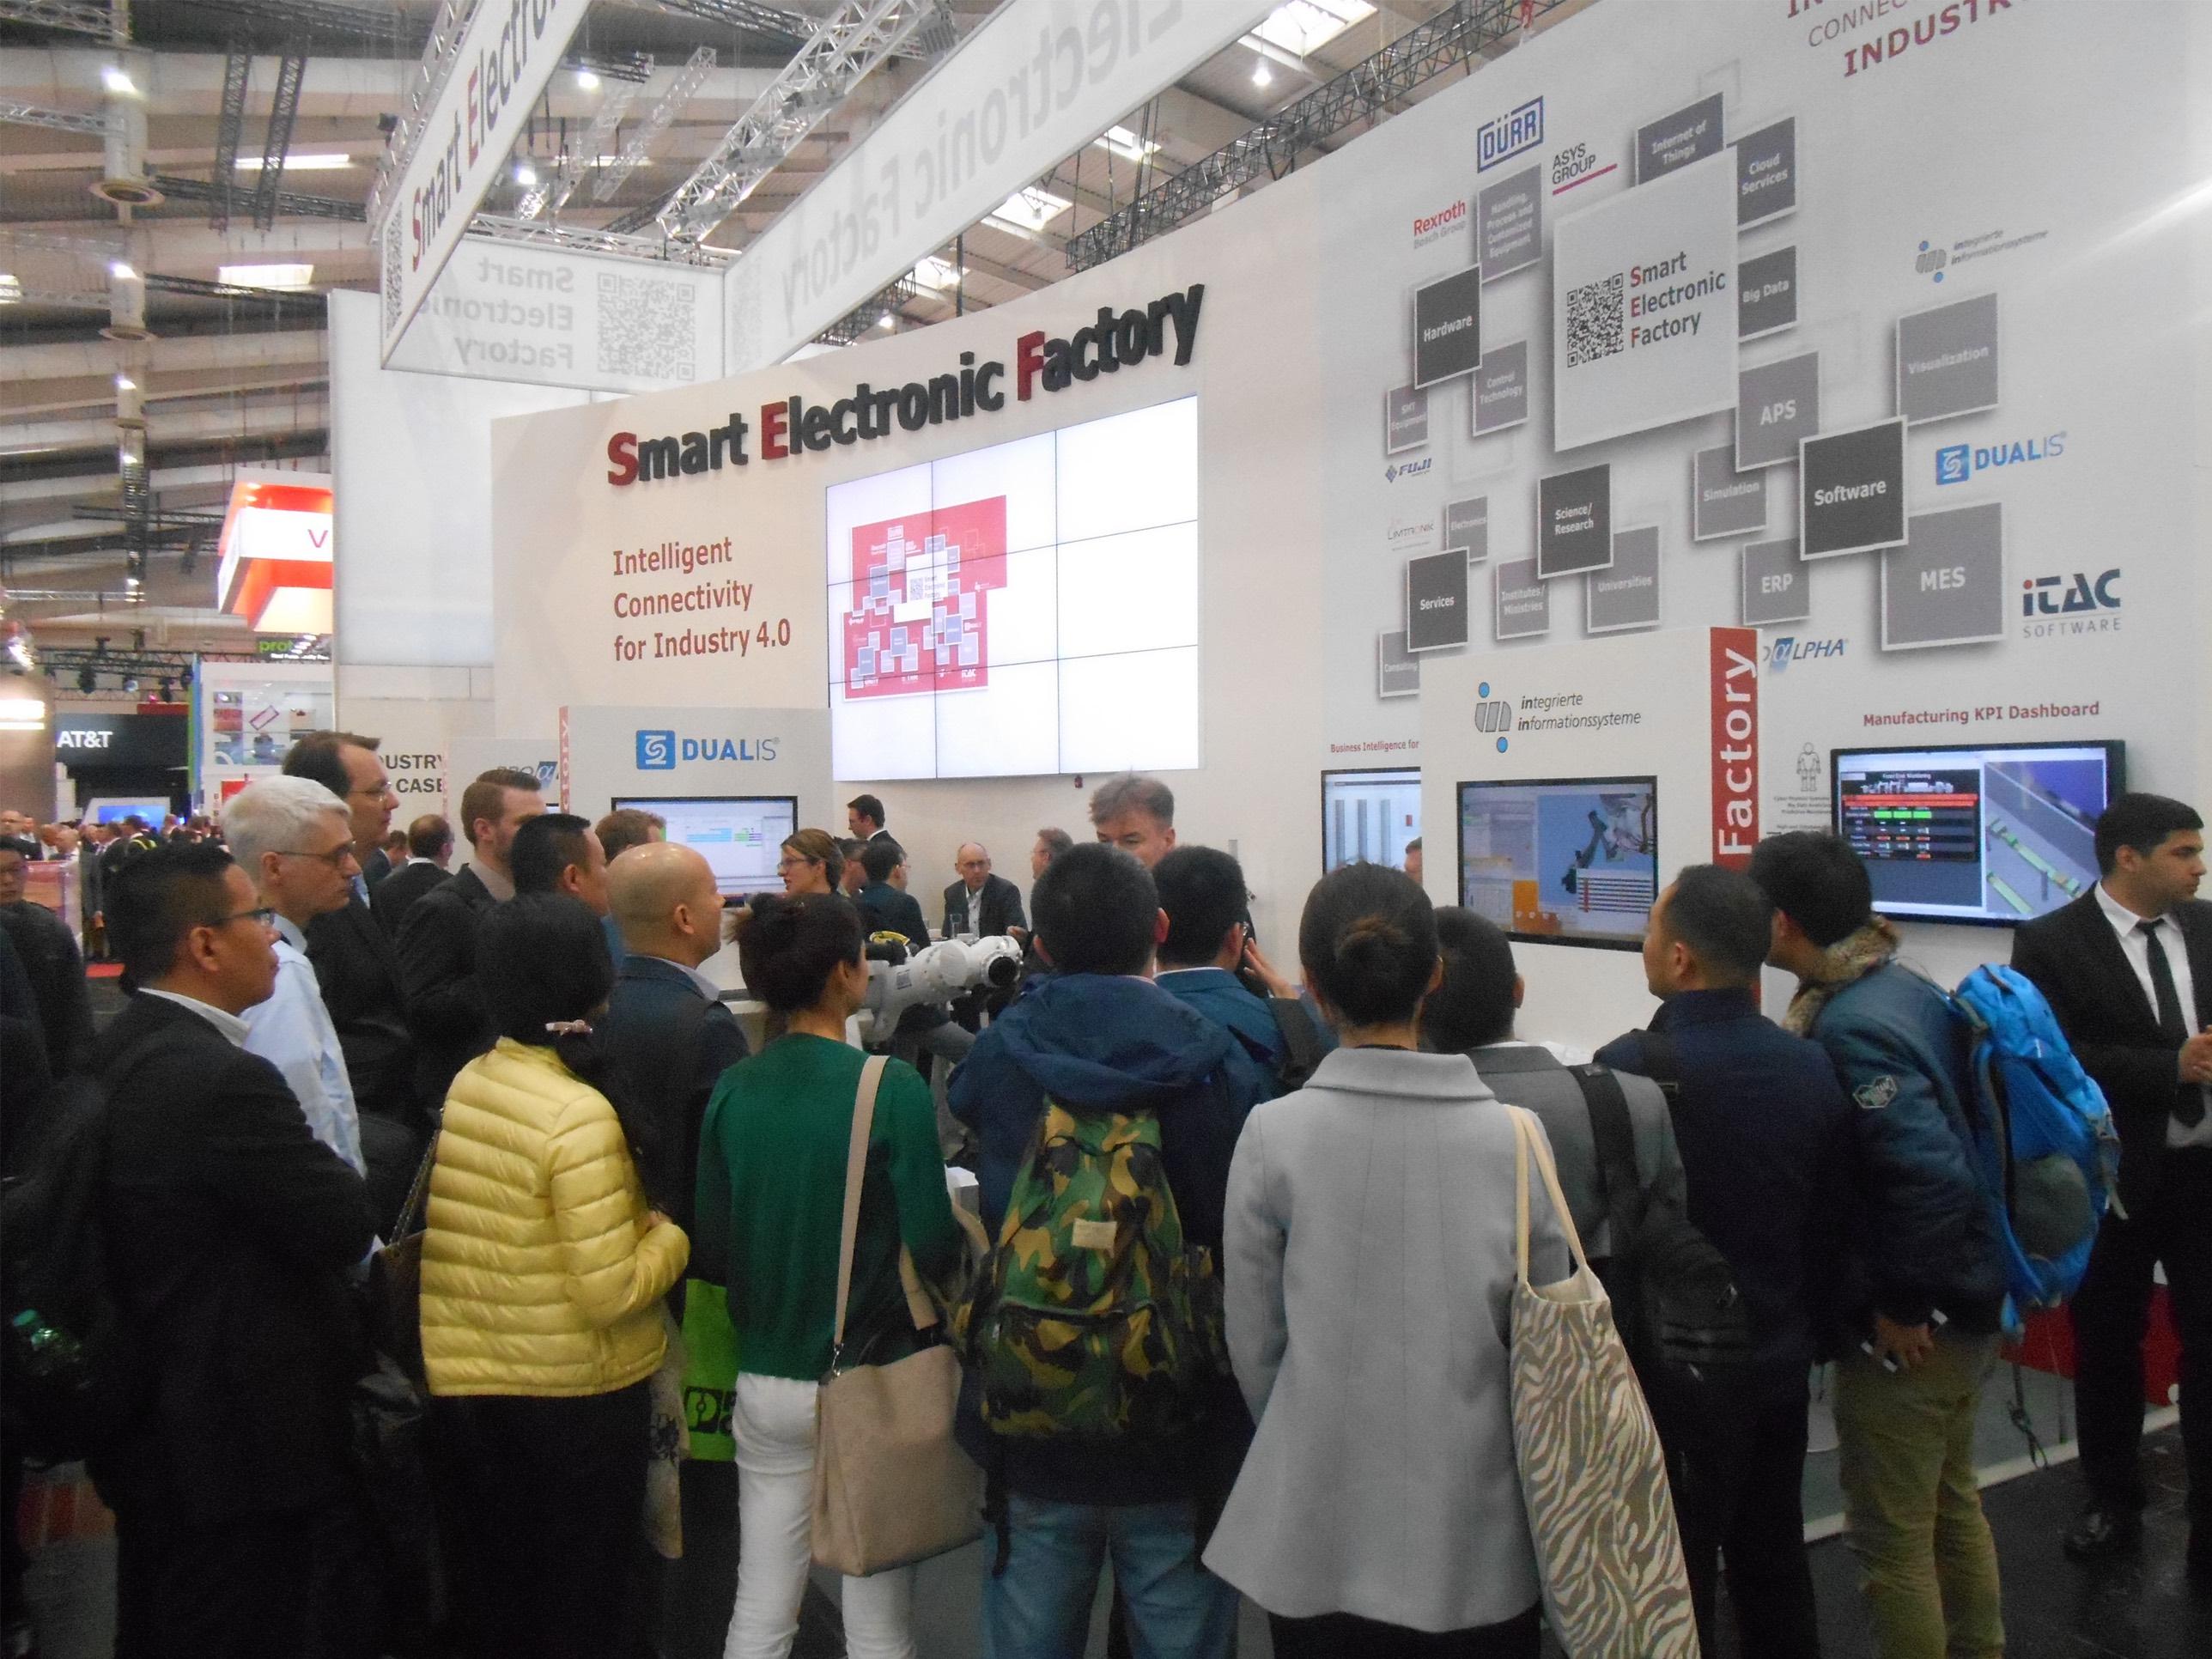 SEF Smart Electronic Factory e.V. auf der HANNOVER MESSE: Mehrwert durch Industrie 4.0